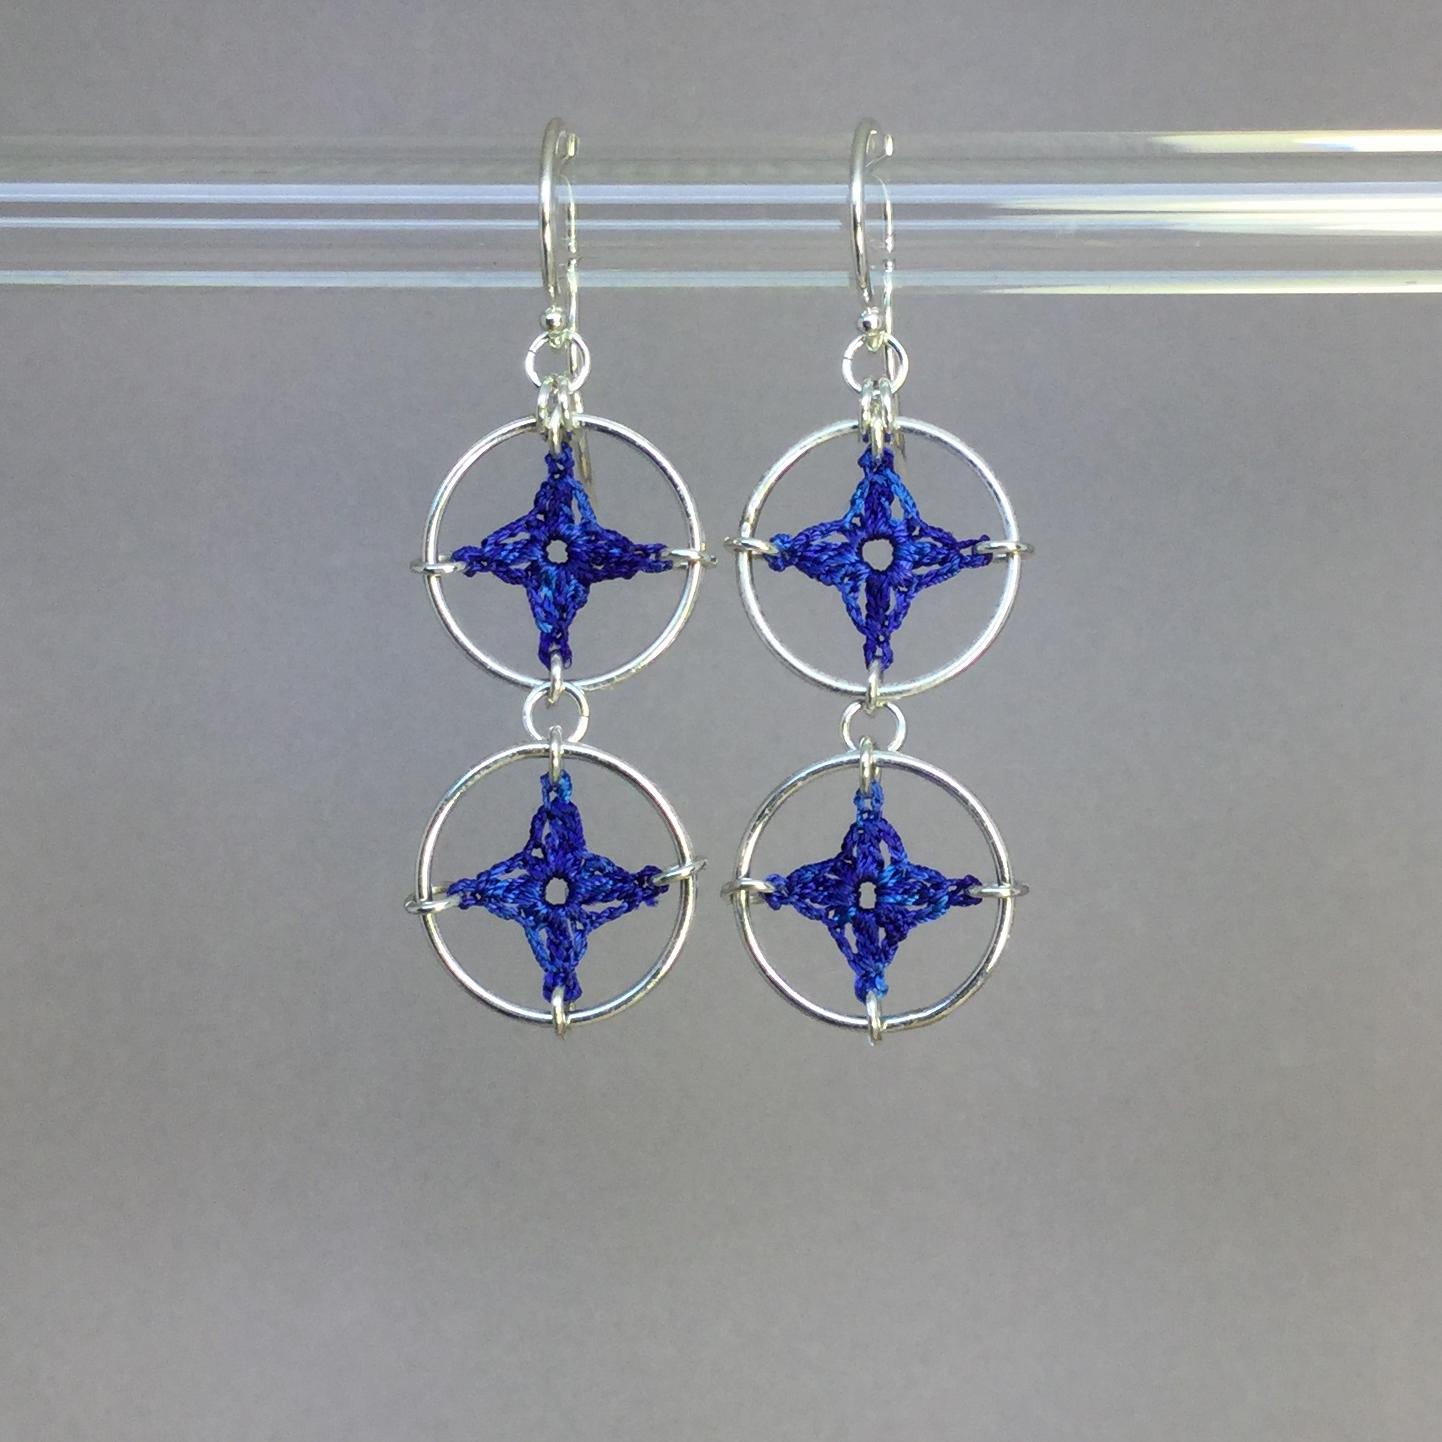 Spangles 2 earrings, silver, blue